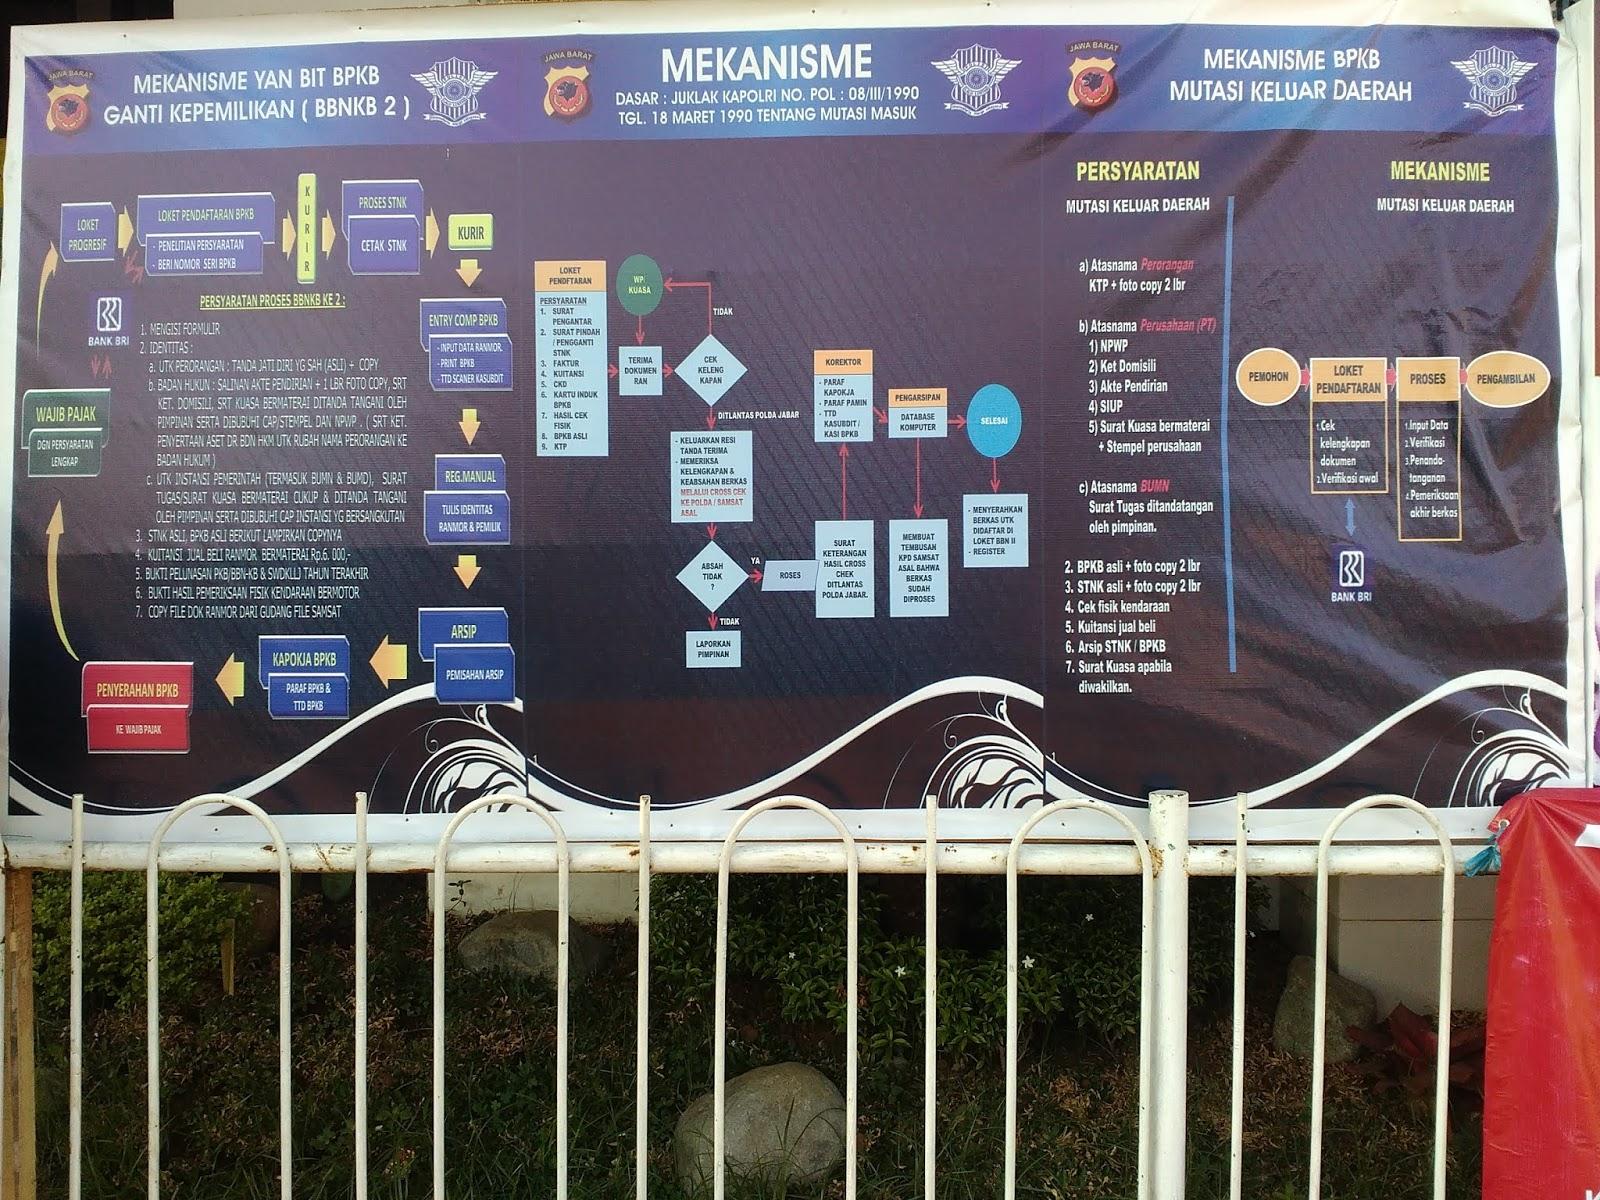 Pengalaman Membuat Skck Di Bandung Terbaru 2018 Mari Membaca